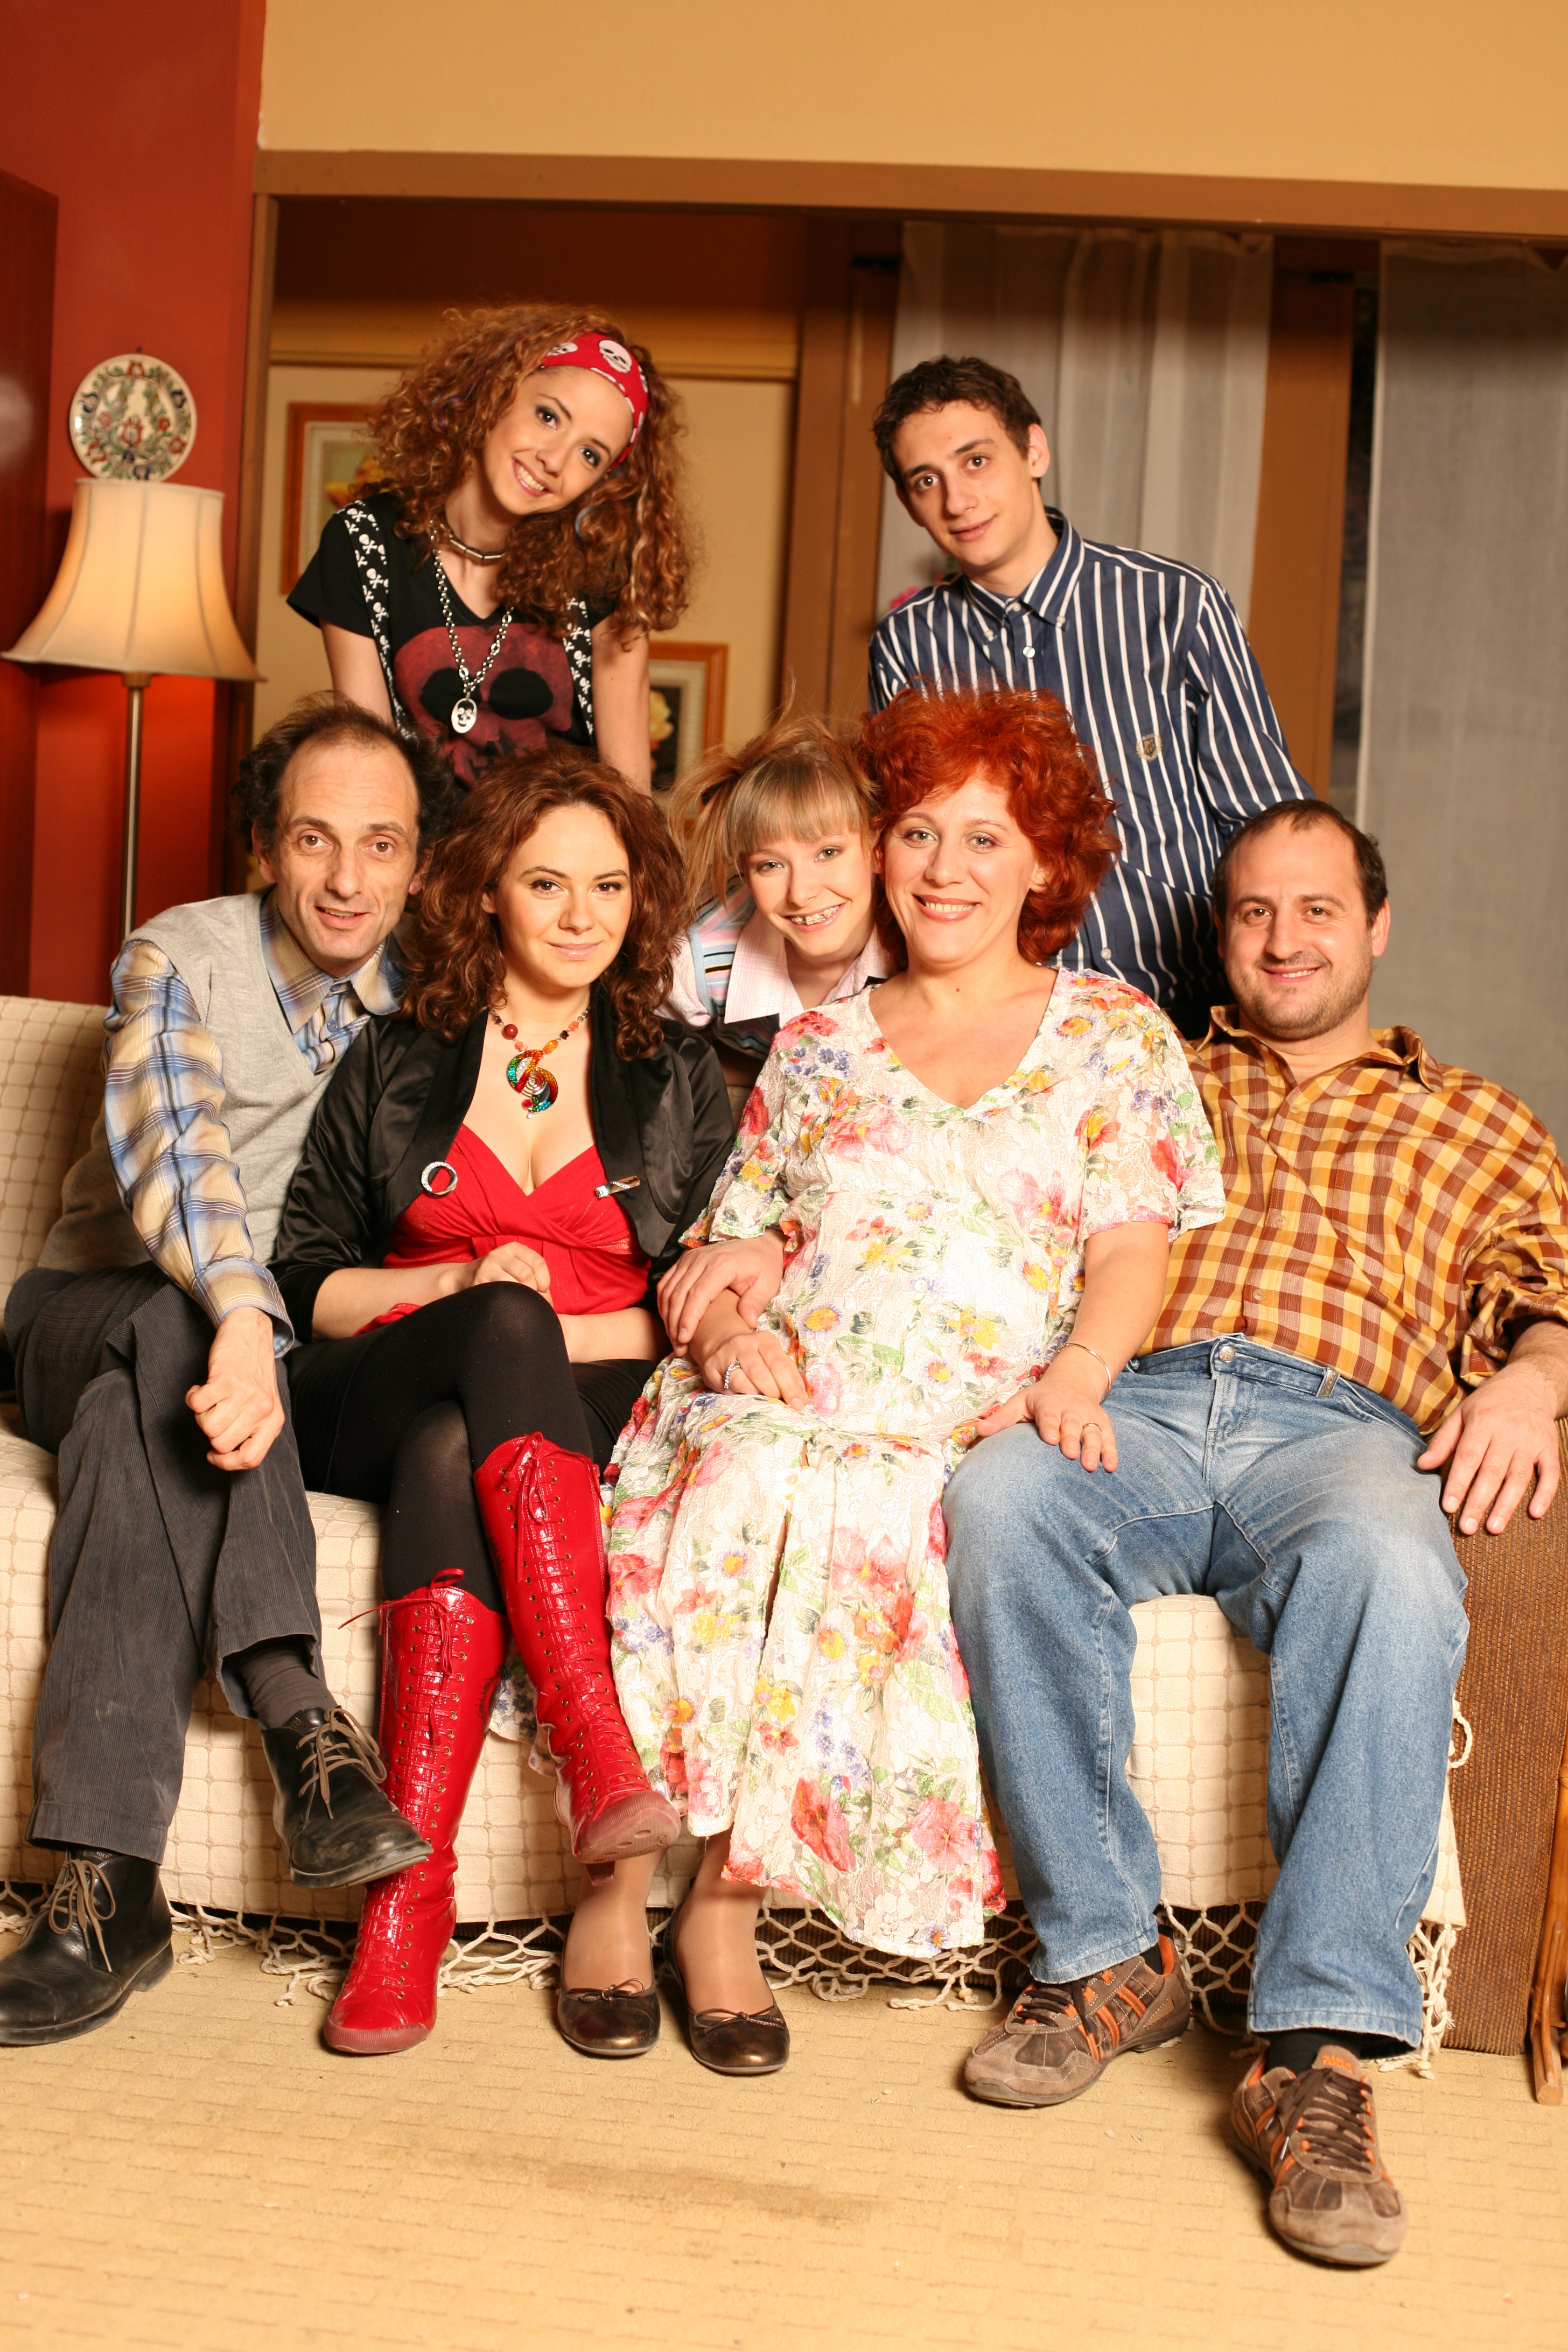 Arestat la domiciliu (TV Series 2008– ) - IMDb